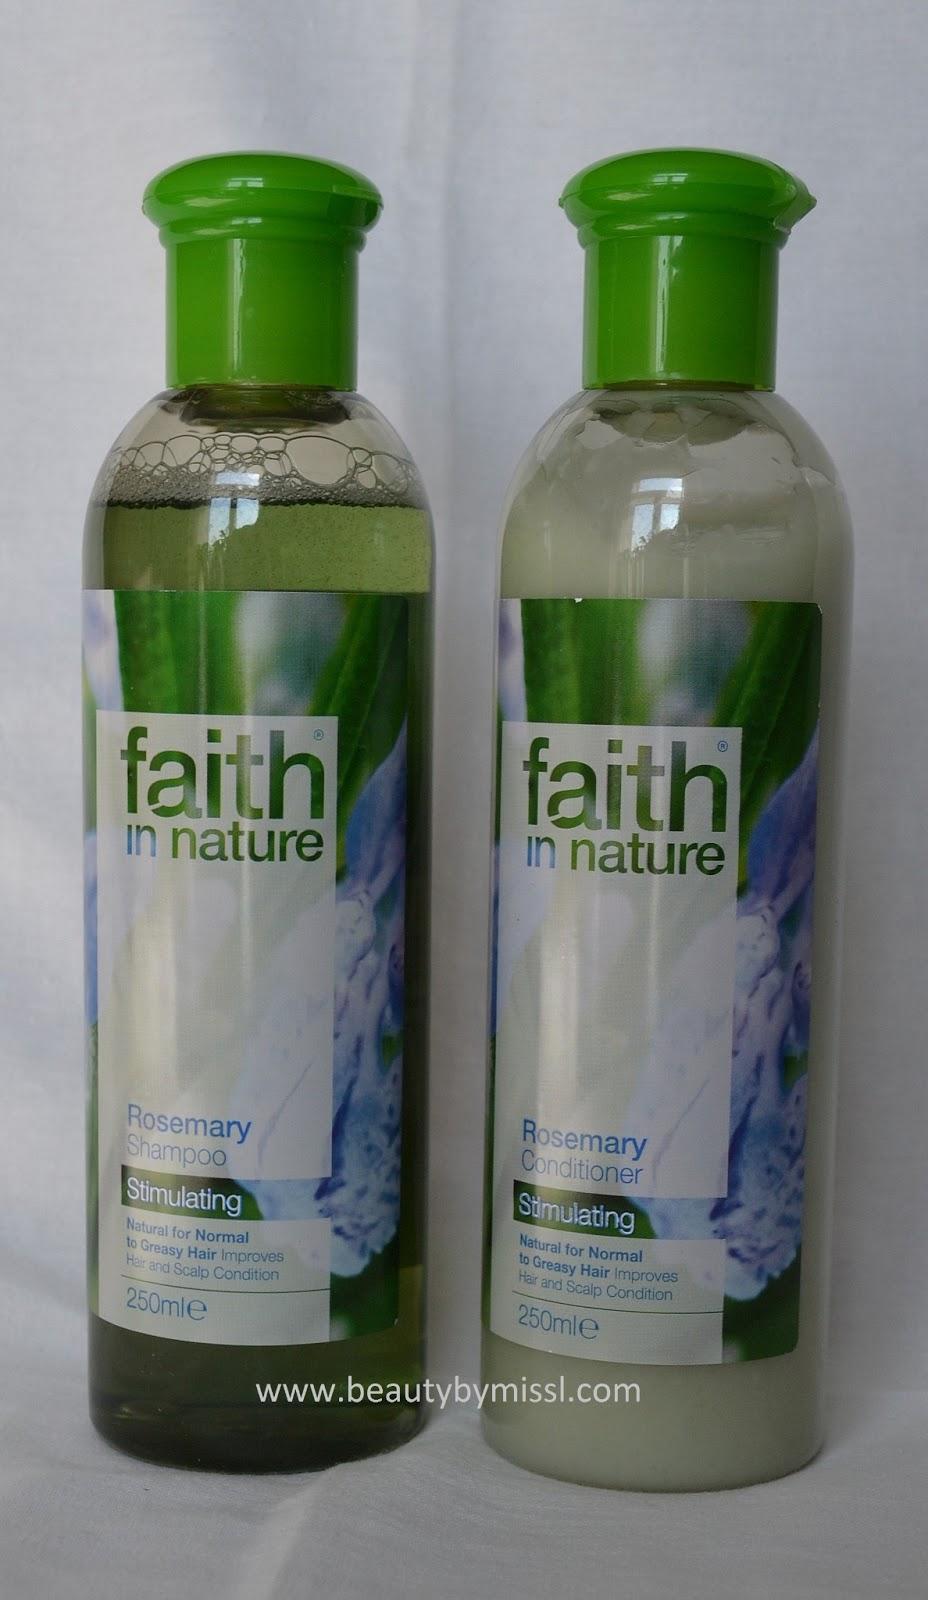 rosmariini shampoon palsam, rosemary shampoo conditioner